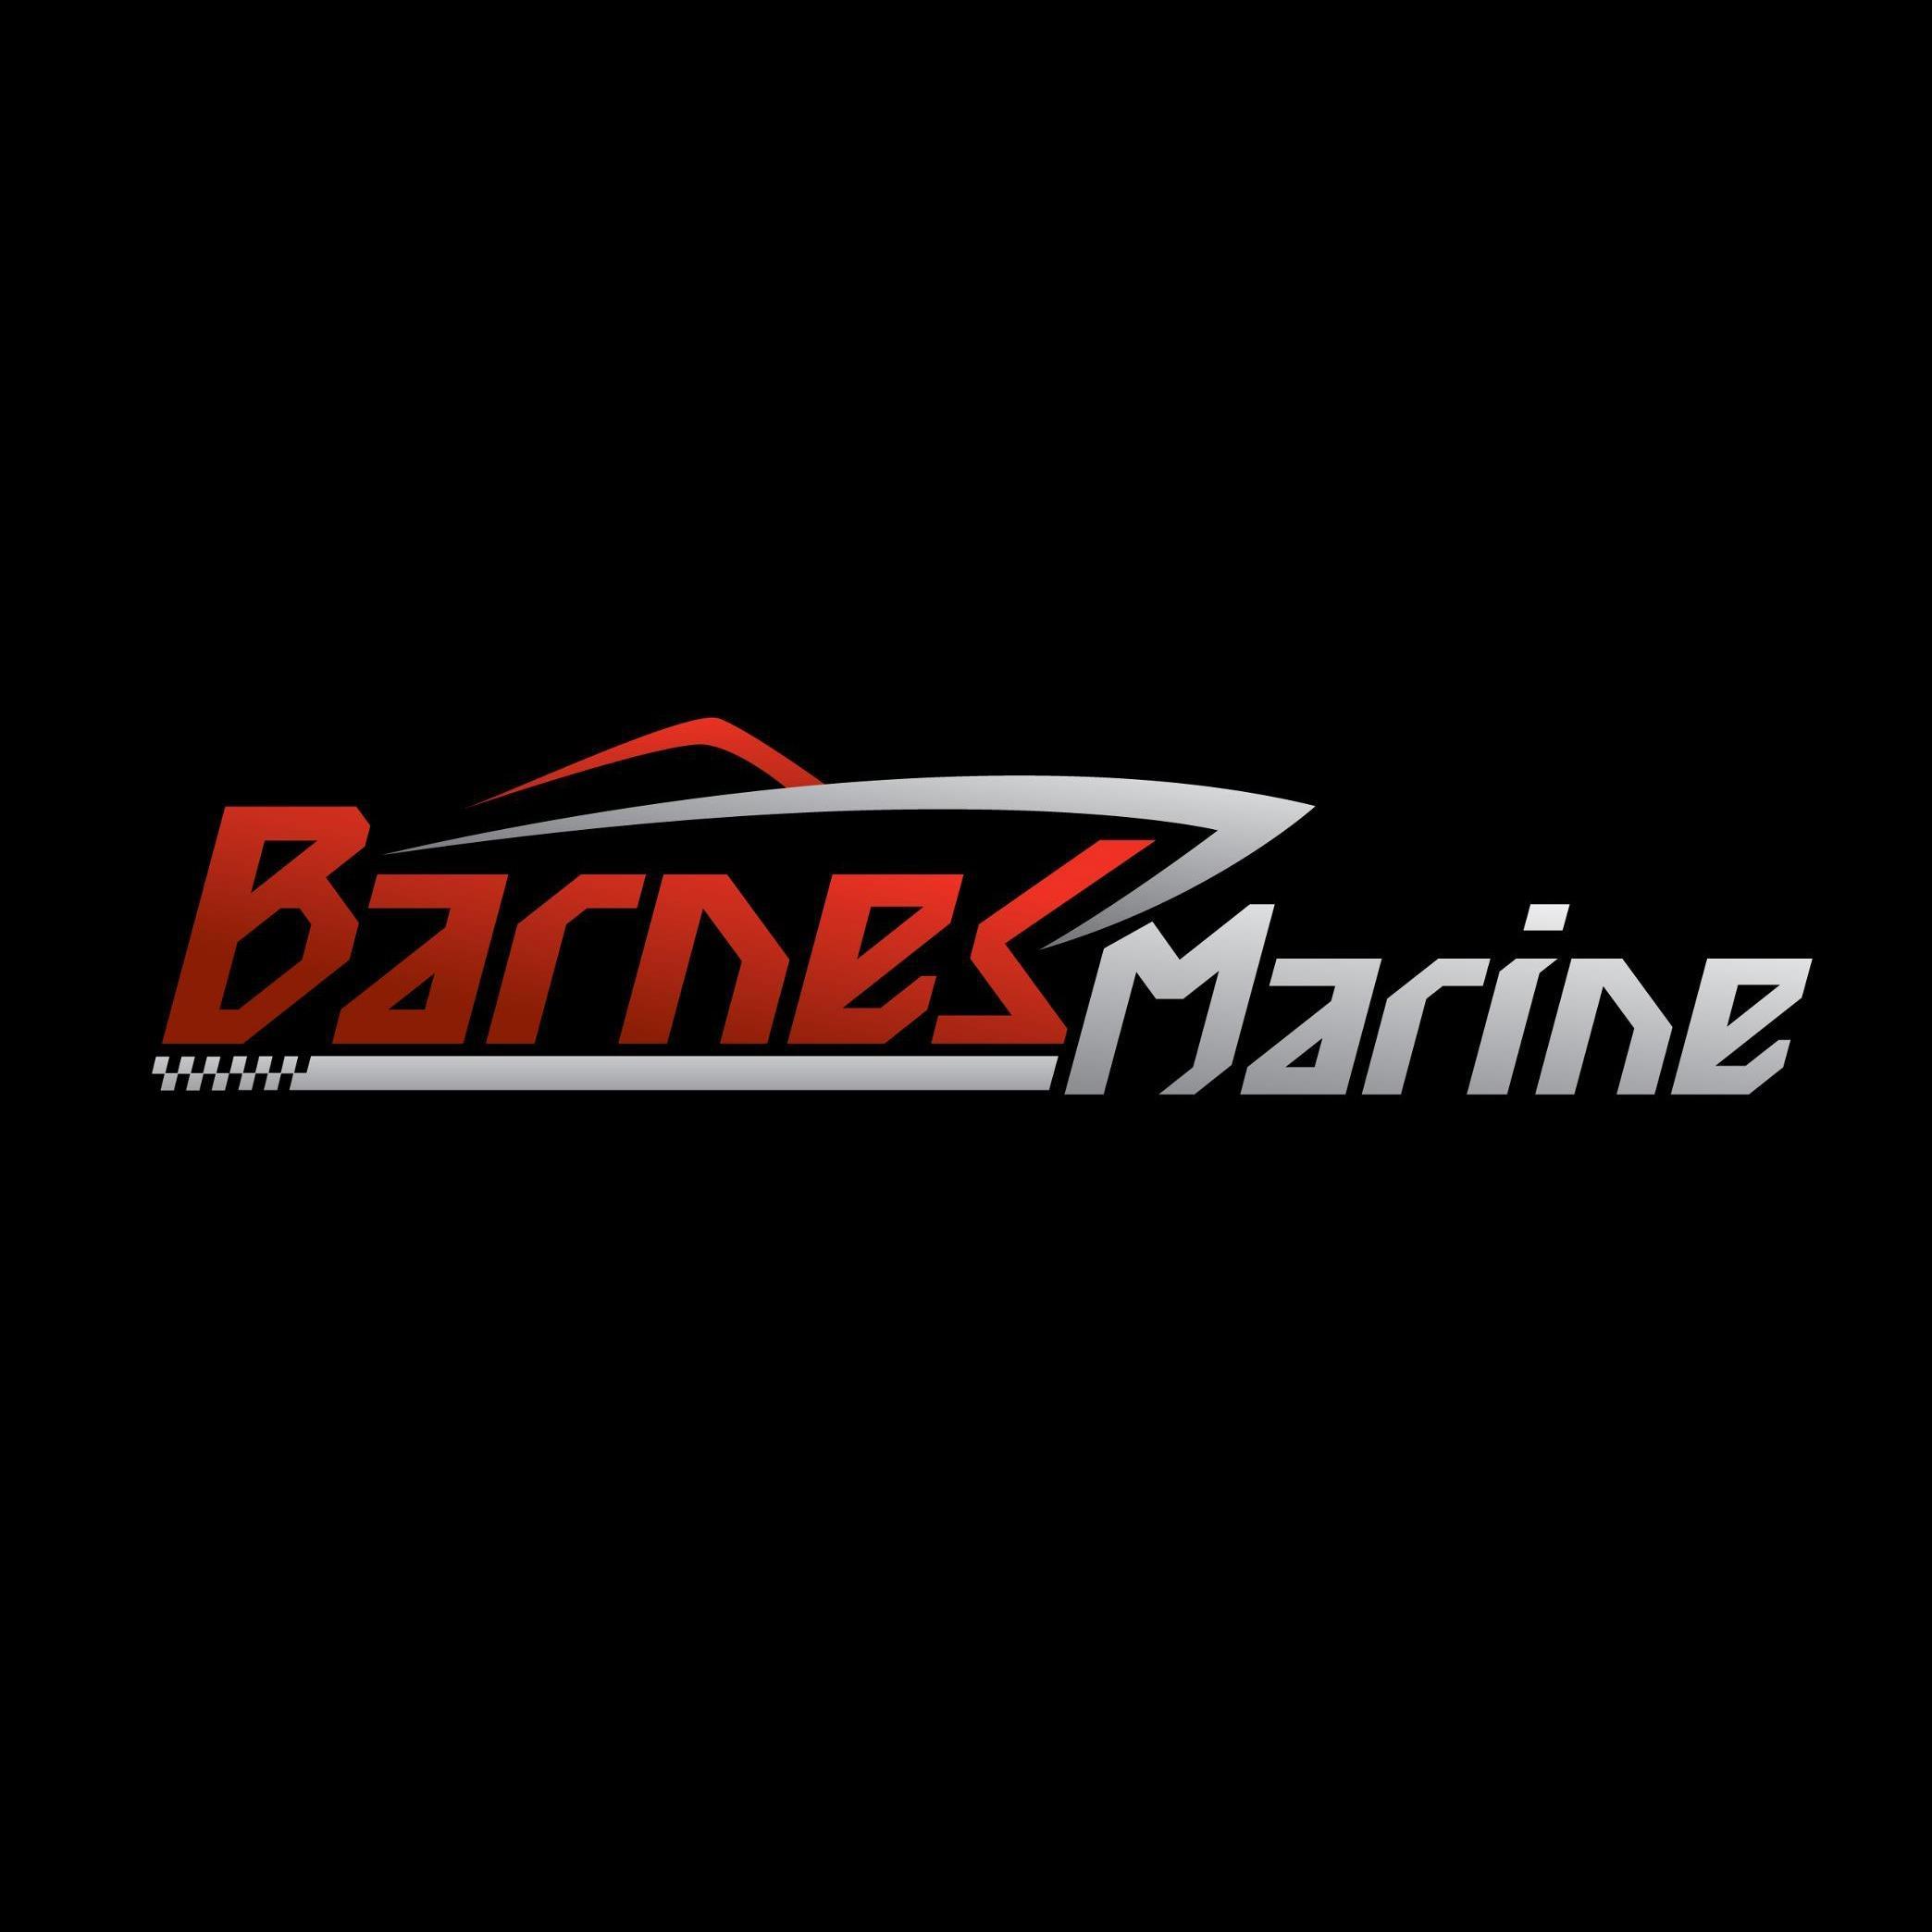 Barnes Marine, Inc.